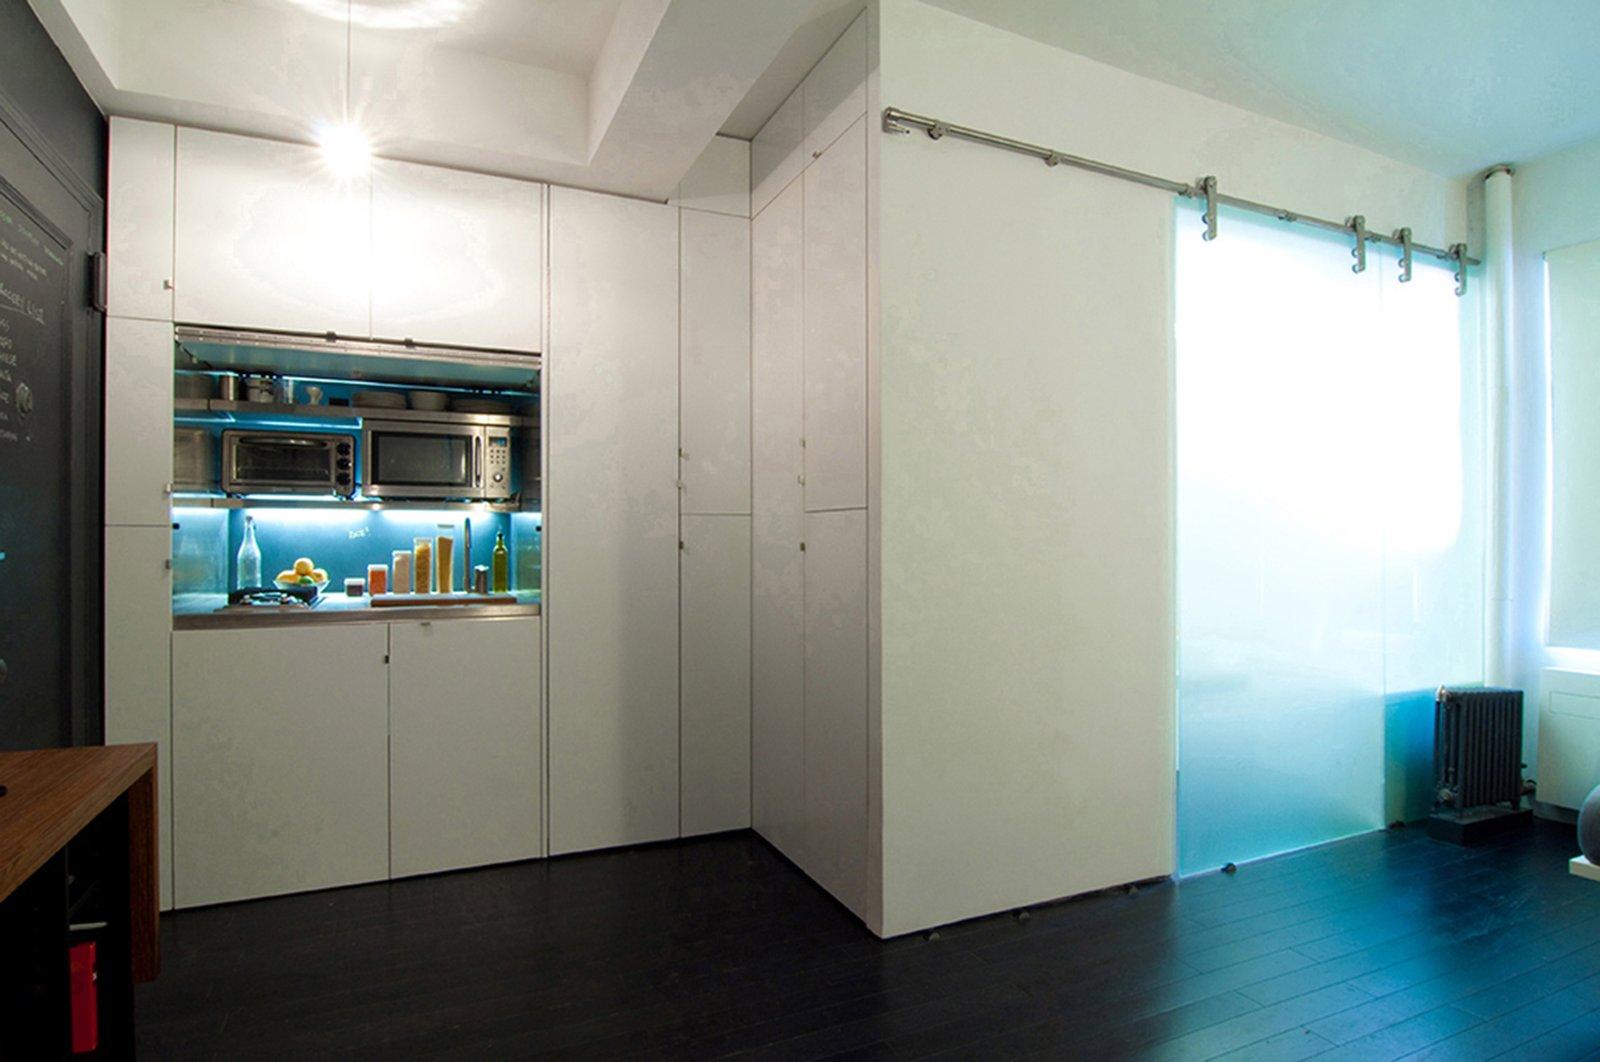 Kitchen, White Cabinet, Bamboo Floor, Ceiling Lighting, Metal Backsplashe, Microwave, Range, Metal Counter, Cooktops, Undermount Sink, Refrigerator, and Pendant Lighting  Park Avenue Studio